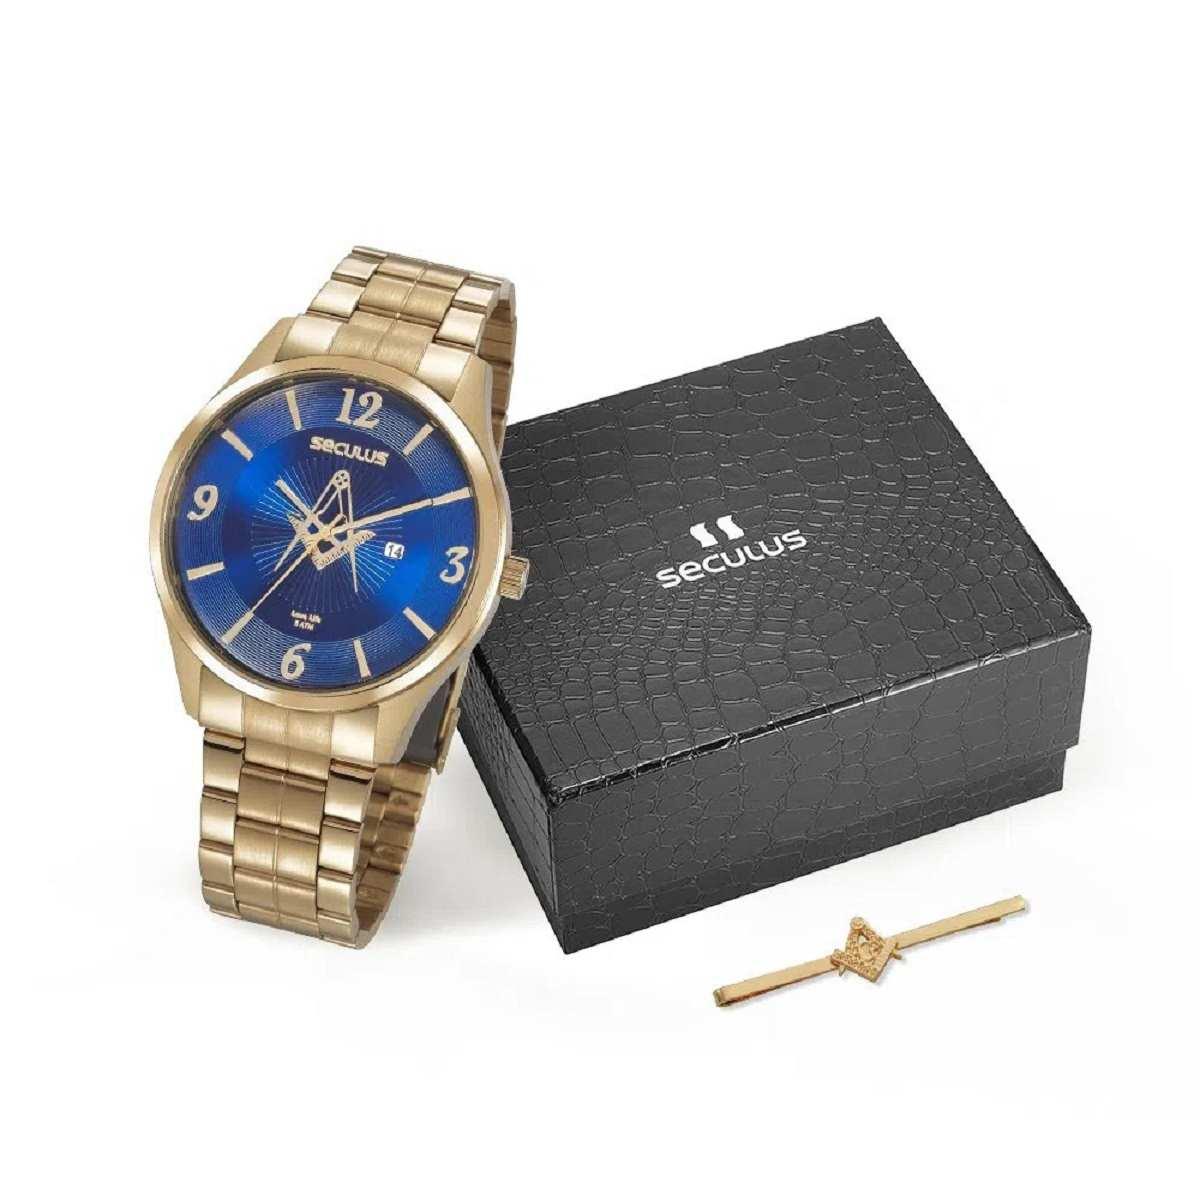 Relógio Seculus Masculino Dourado Maçonaria 20762GPSKDA1K1